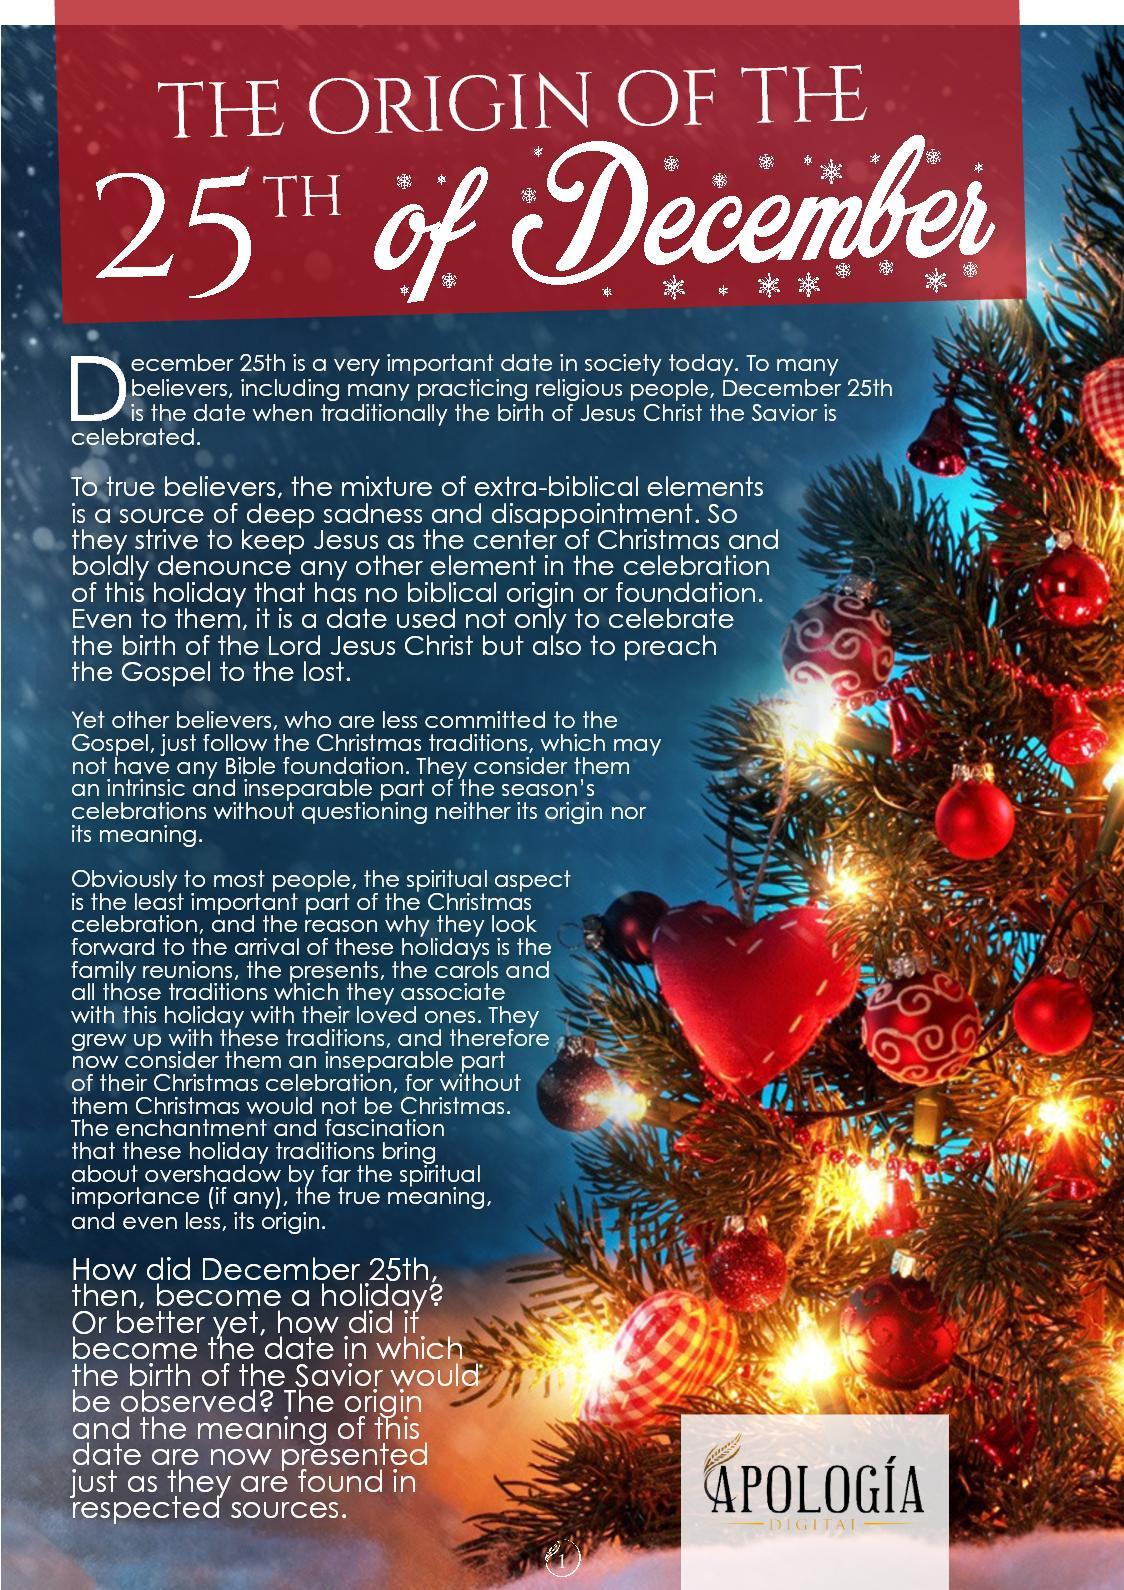 calamo the origin of the 25th of december